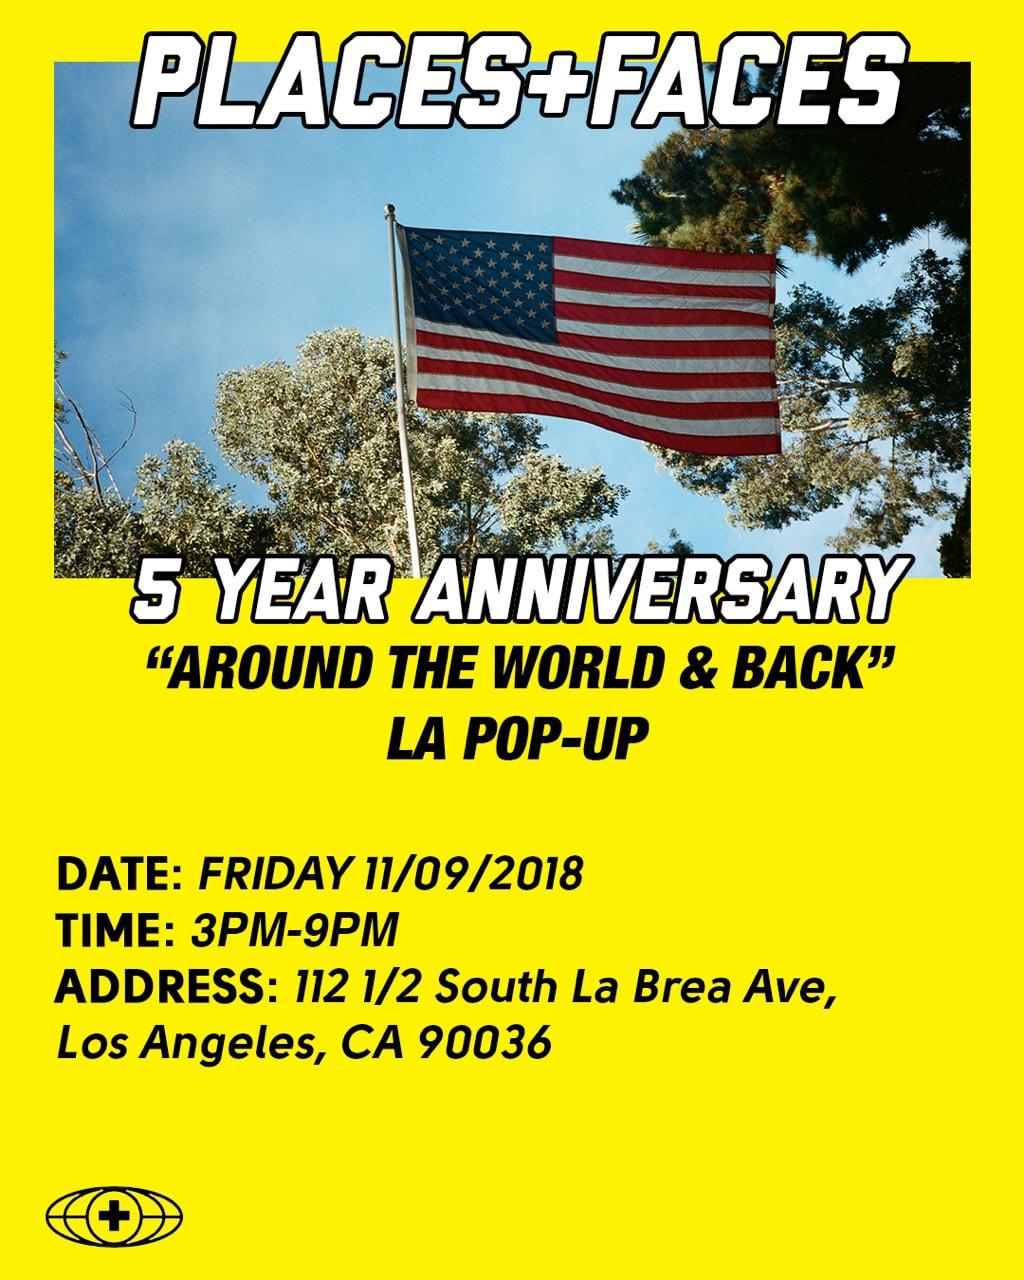 Places+Faces 5th Anniversary LA Pop-Up Location